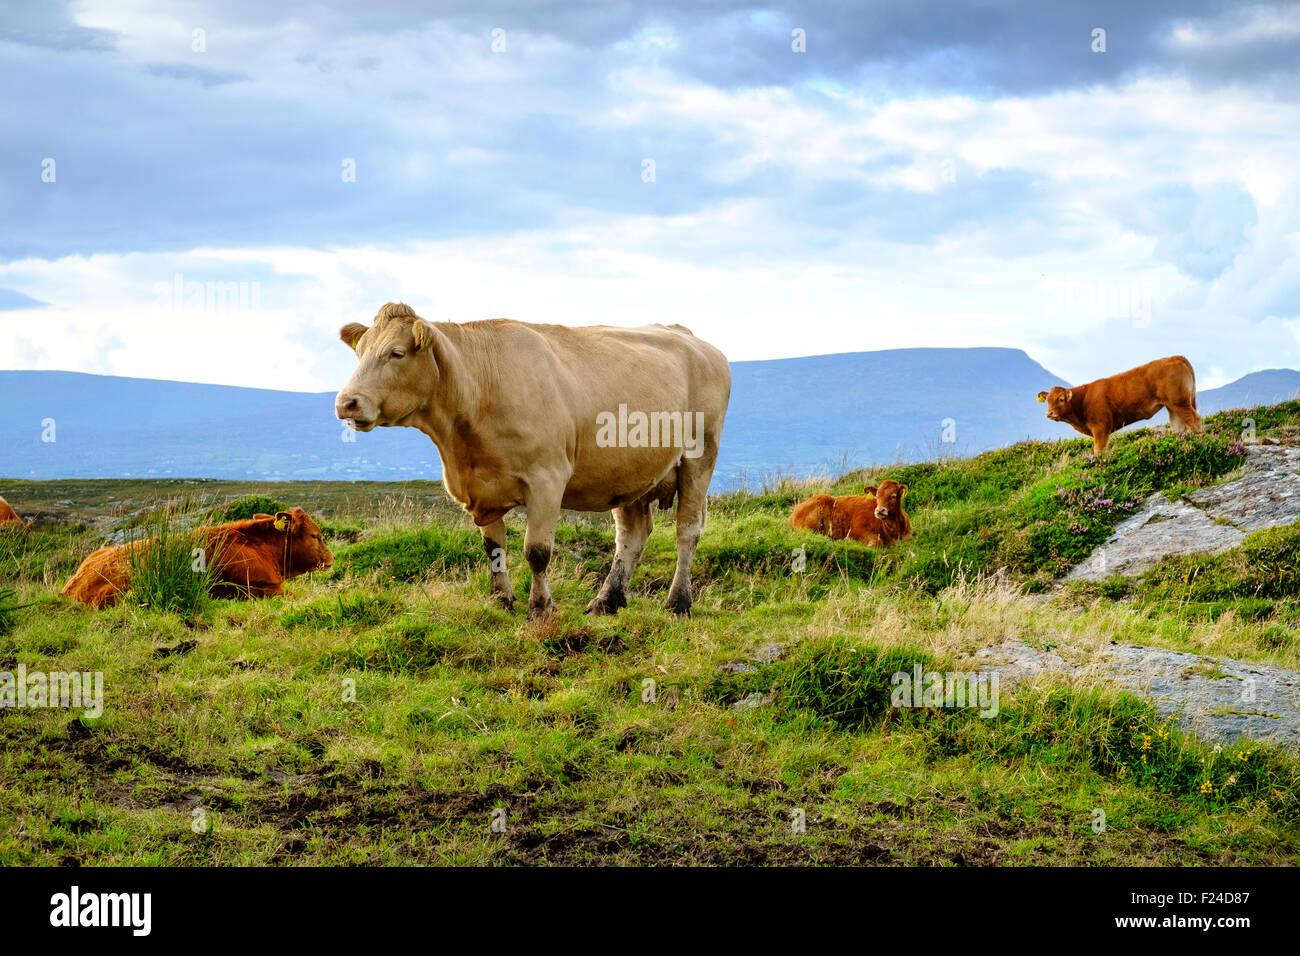 Vache veau veaux Bovins jersey Irlande Royaume-Uni Photo Stock